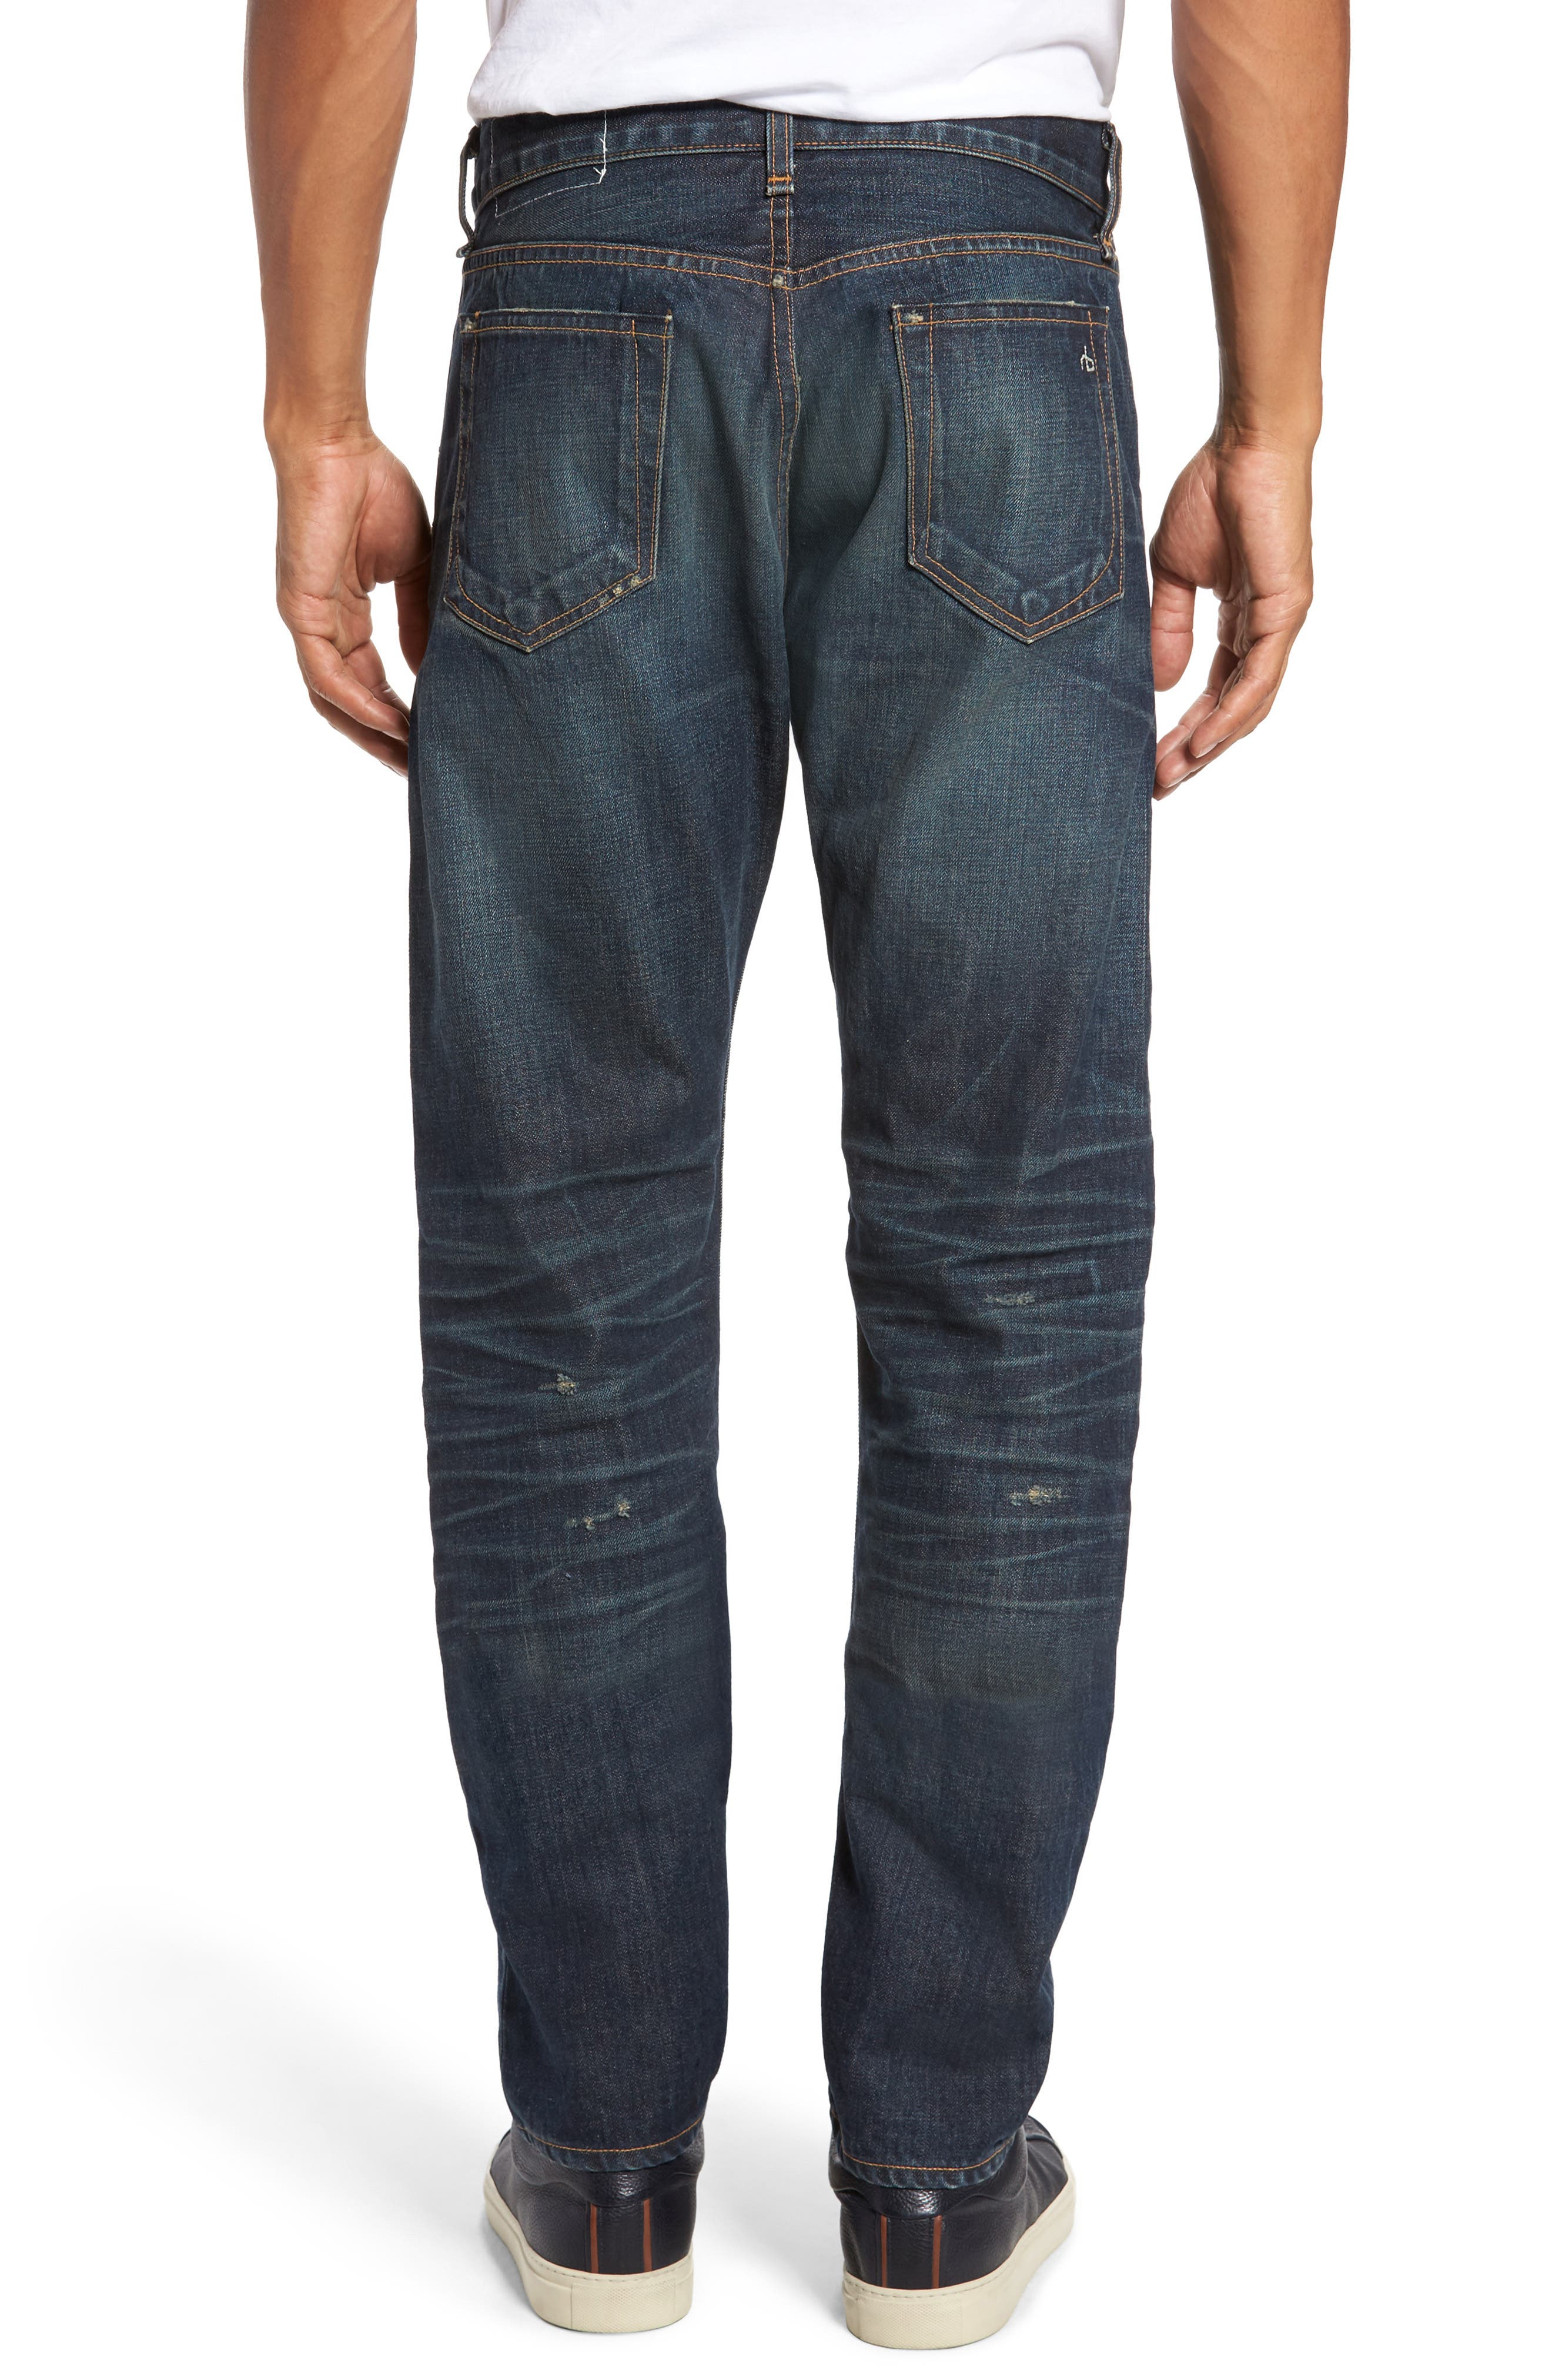 Alternate Image 2  - rag & bone Fit 2 Slim Fit Jeans (Zeitgeist)